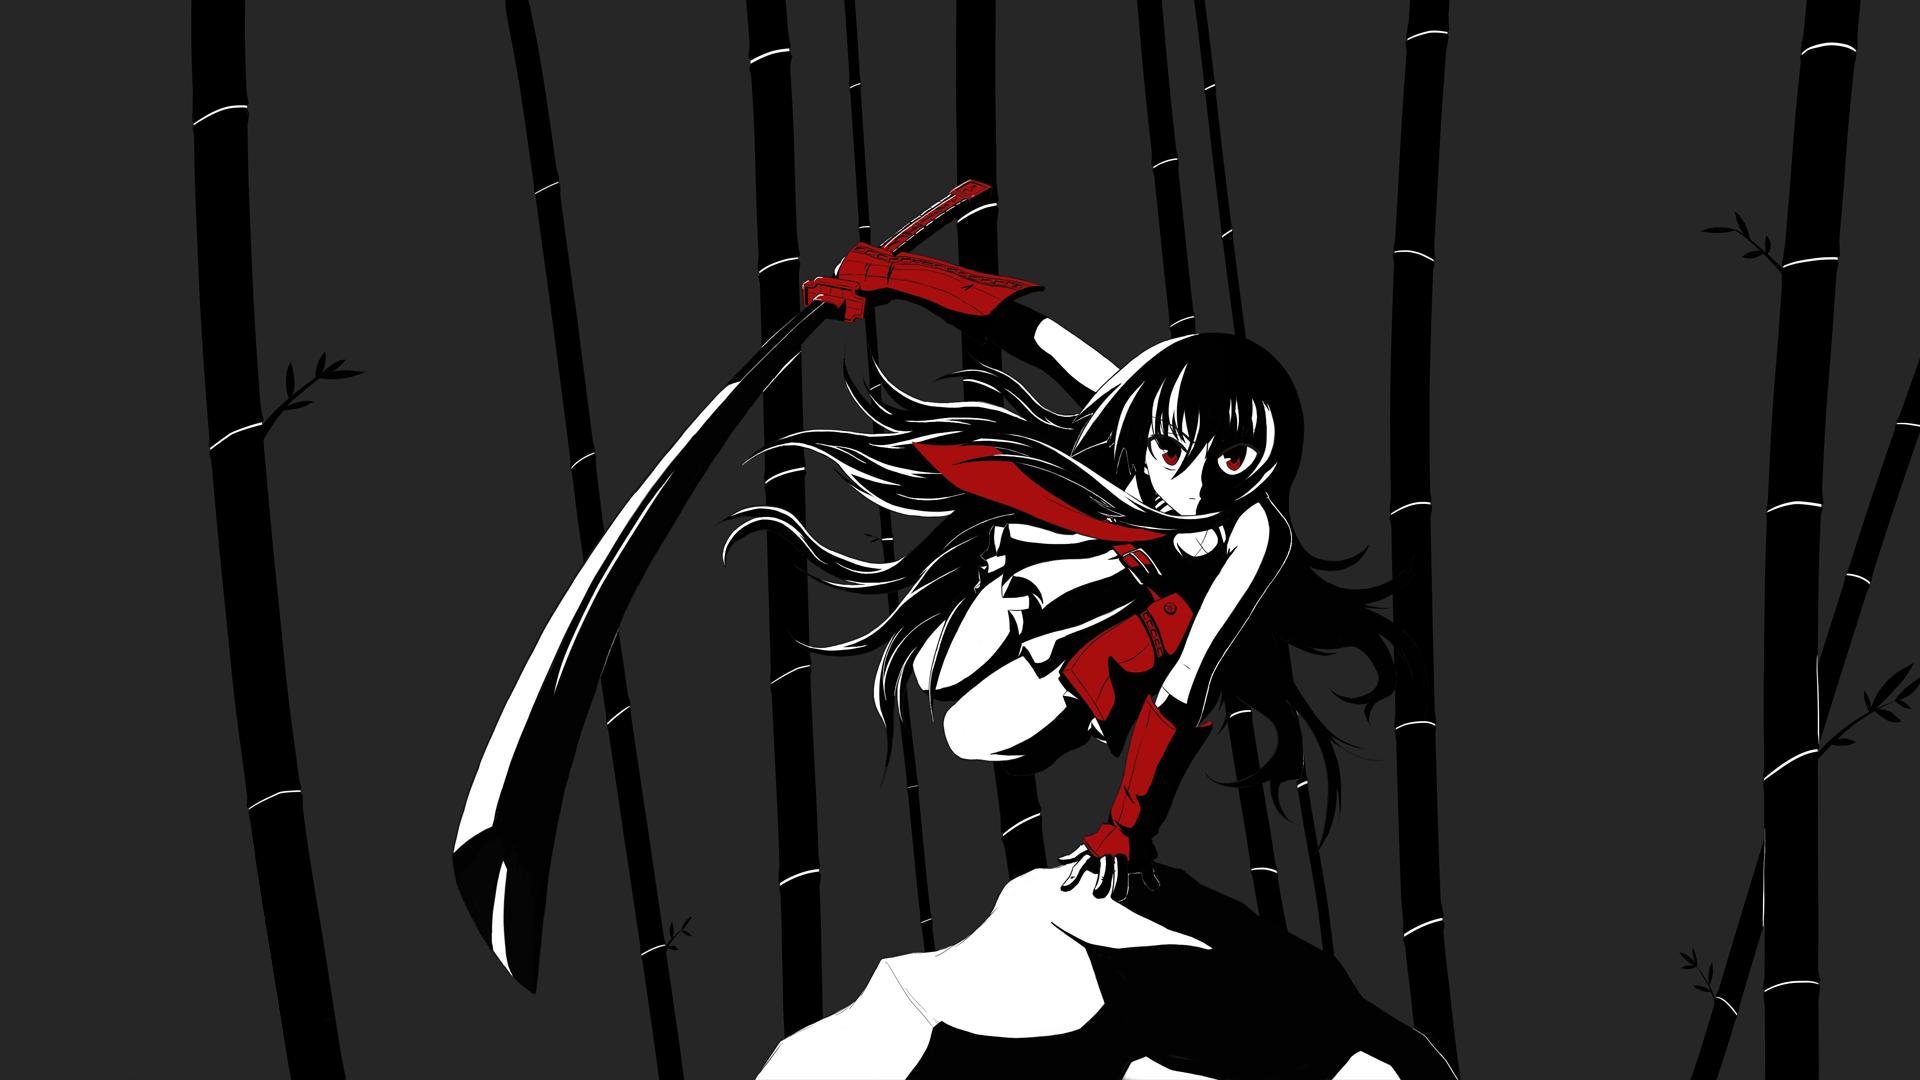 Akame Ga Kill Computer Wallpapers Desktop Backgrounds 1920x1080 Id 554298 Akame Ga Akame Ga Kill Anime Wallpaper